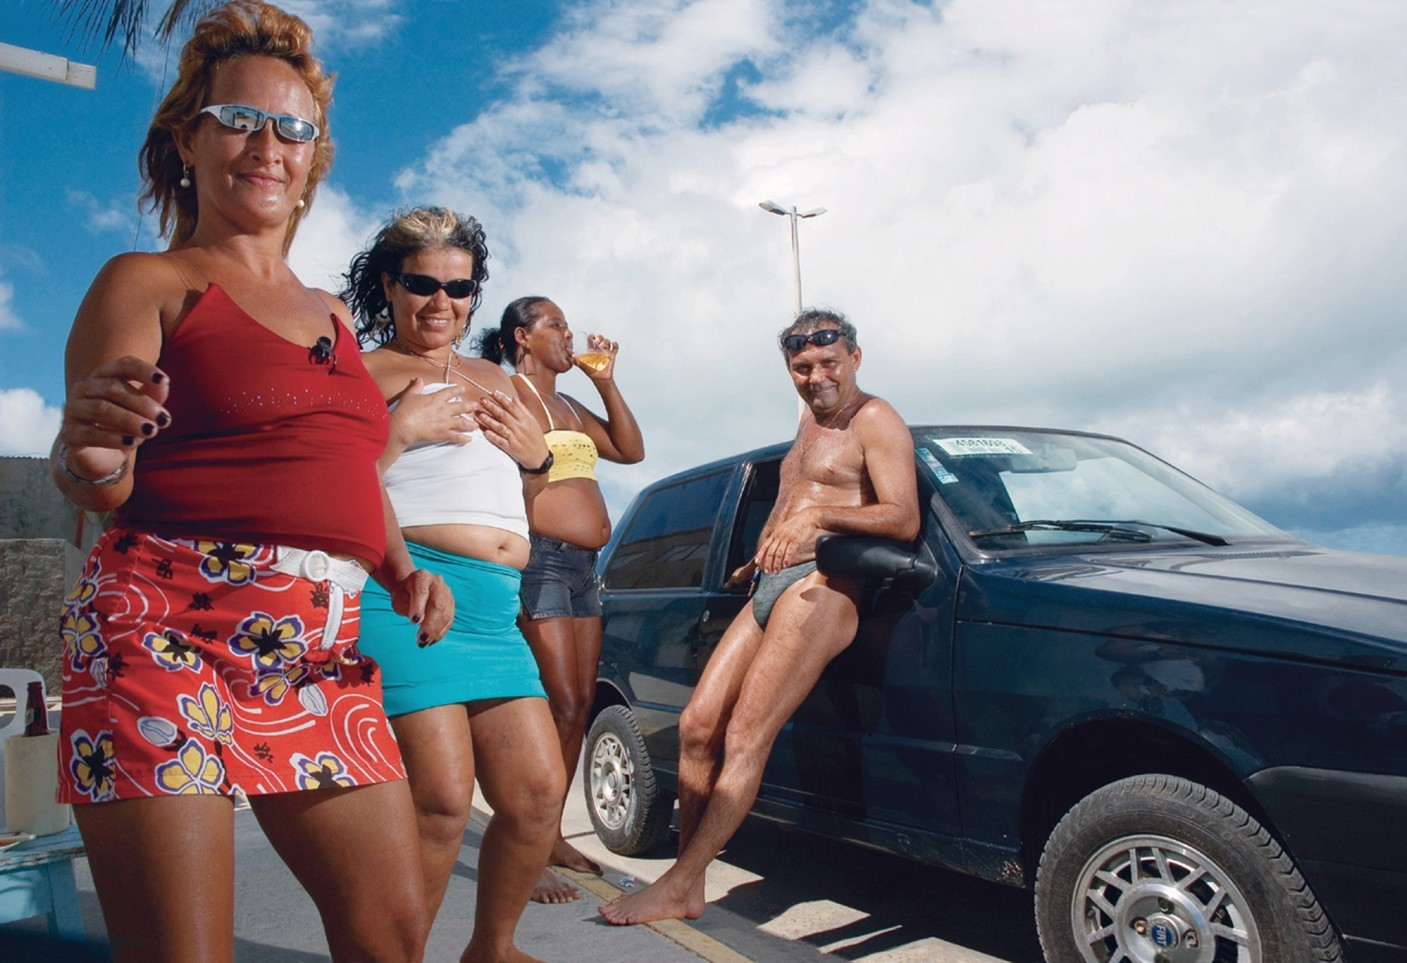 ba-rbara-wagner-untitled-vii-from-the-series-brasi-lia-teimosa-:-stubborn-brasi-lia-2005-2007-.jpg